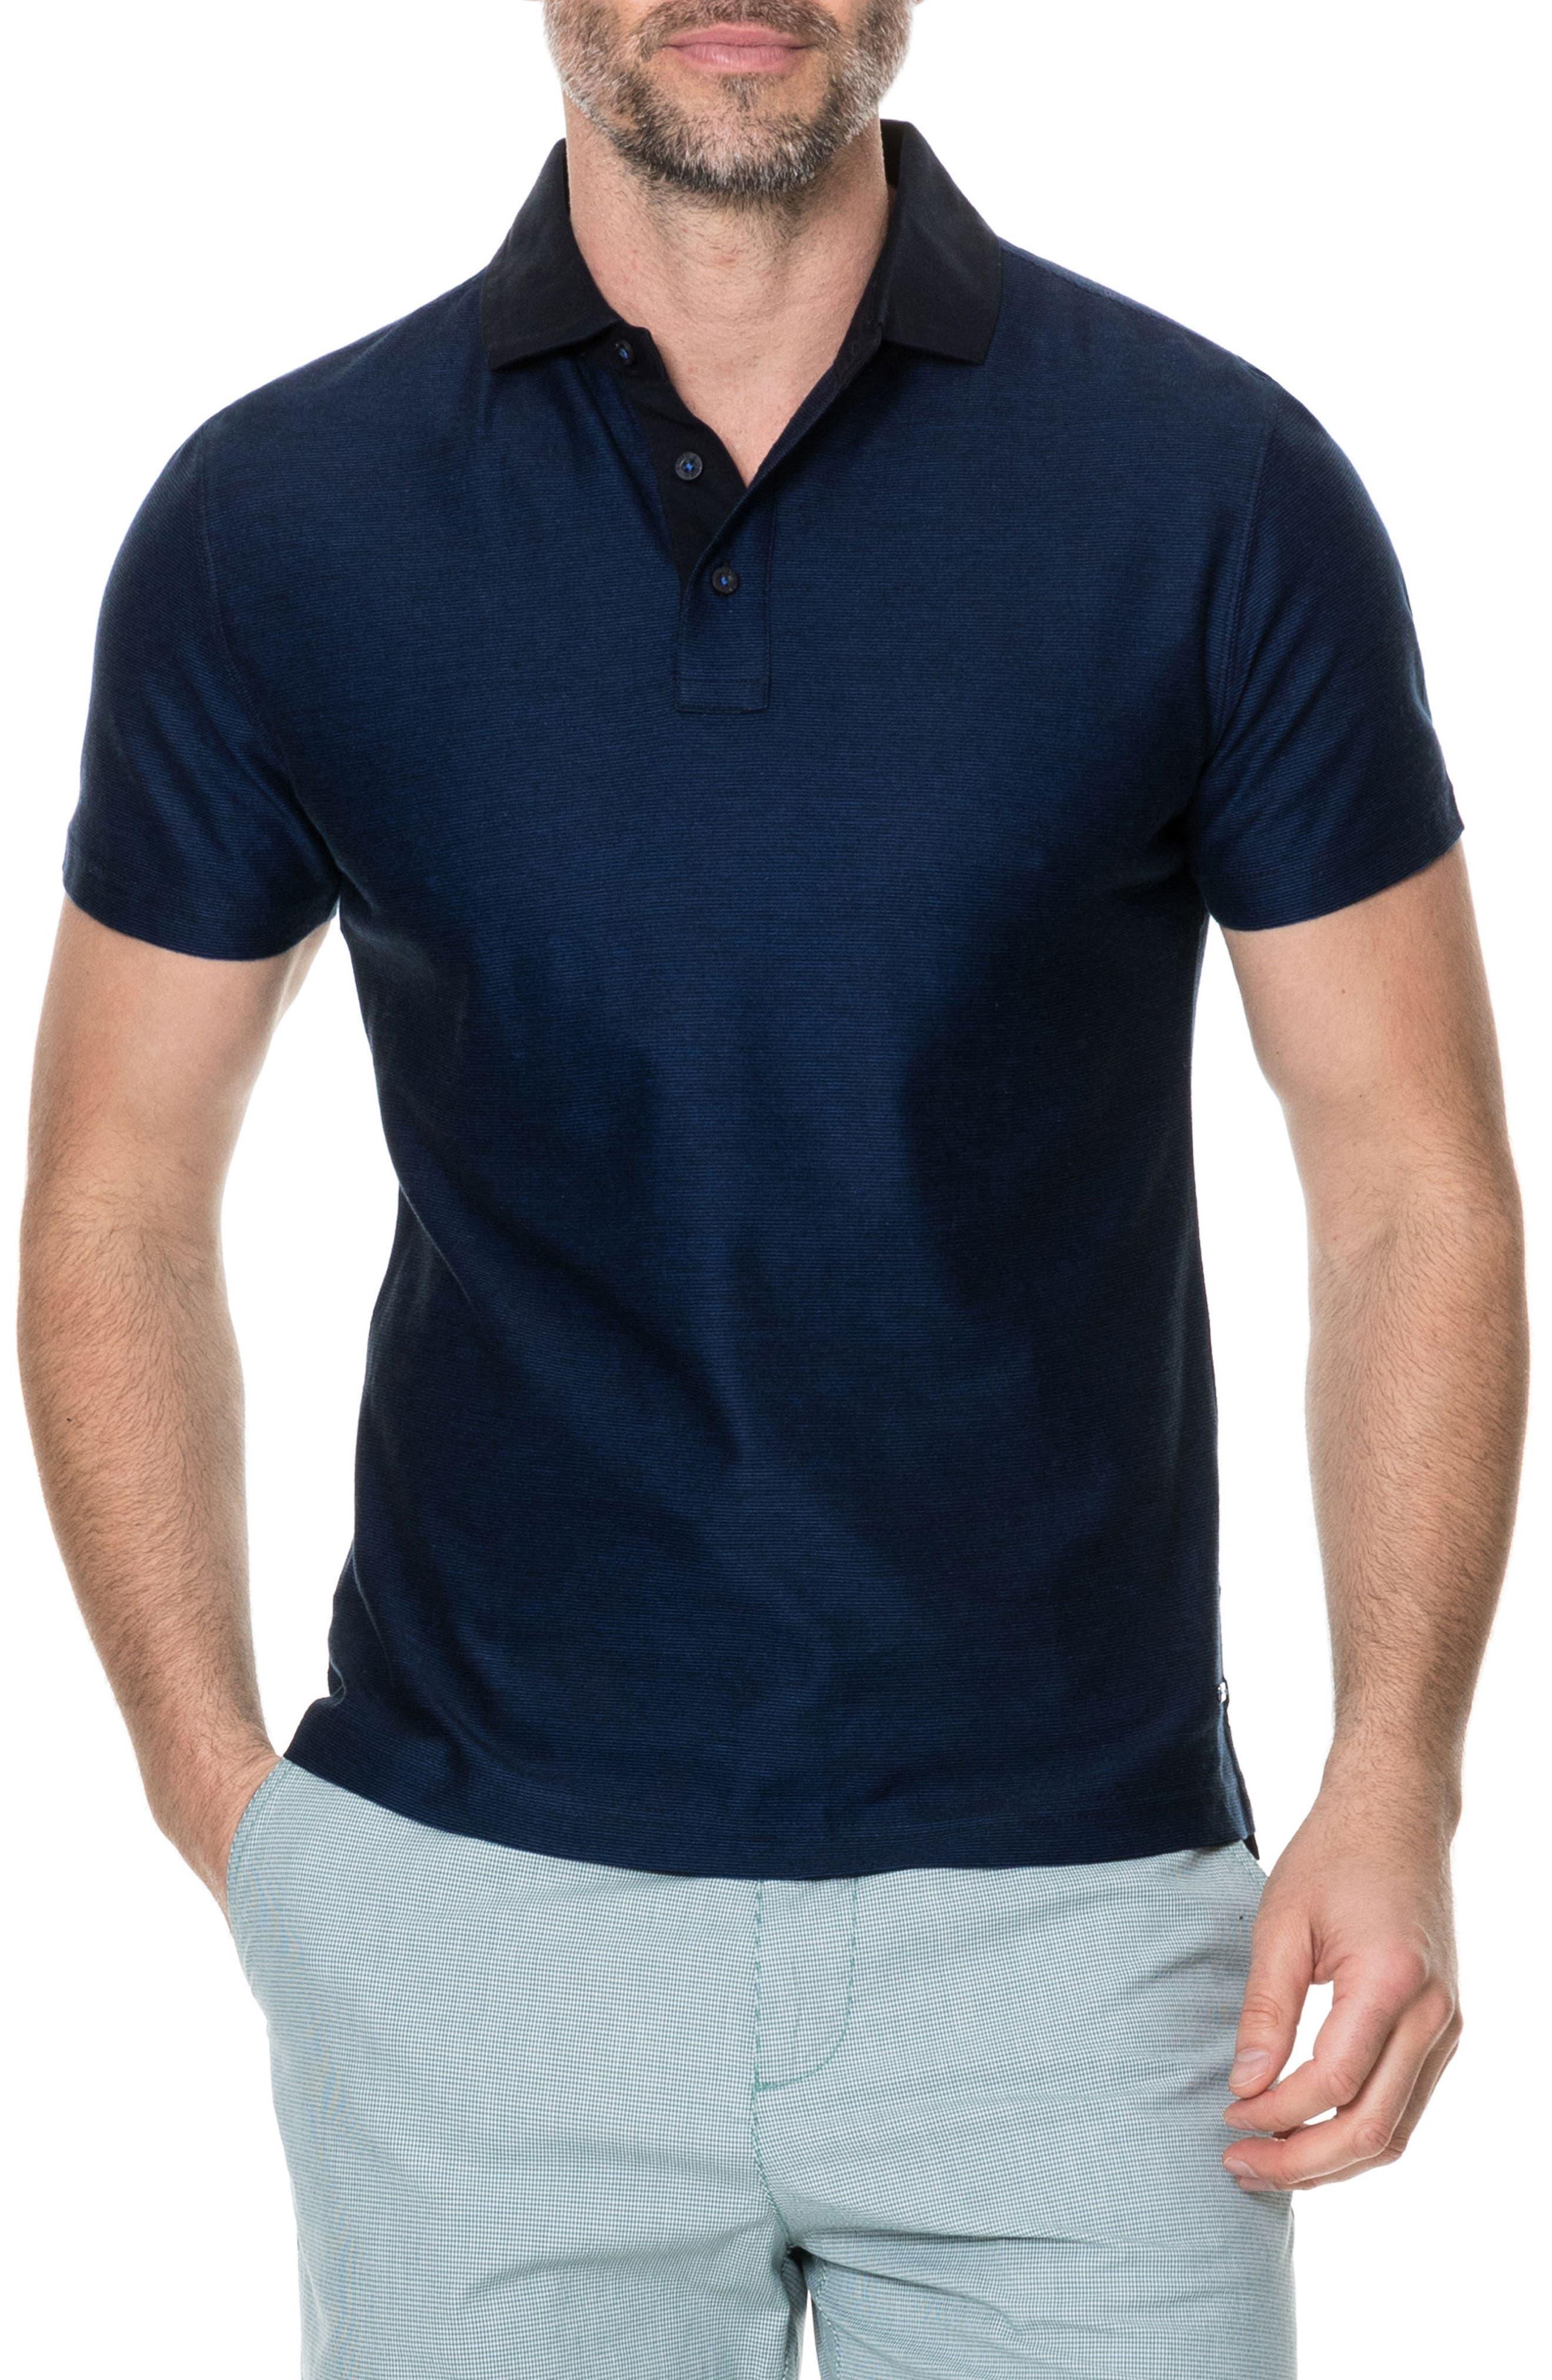 Caplestone Regular Fit Polo,                         Main,                         color, 401